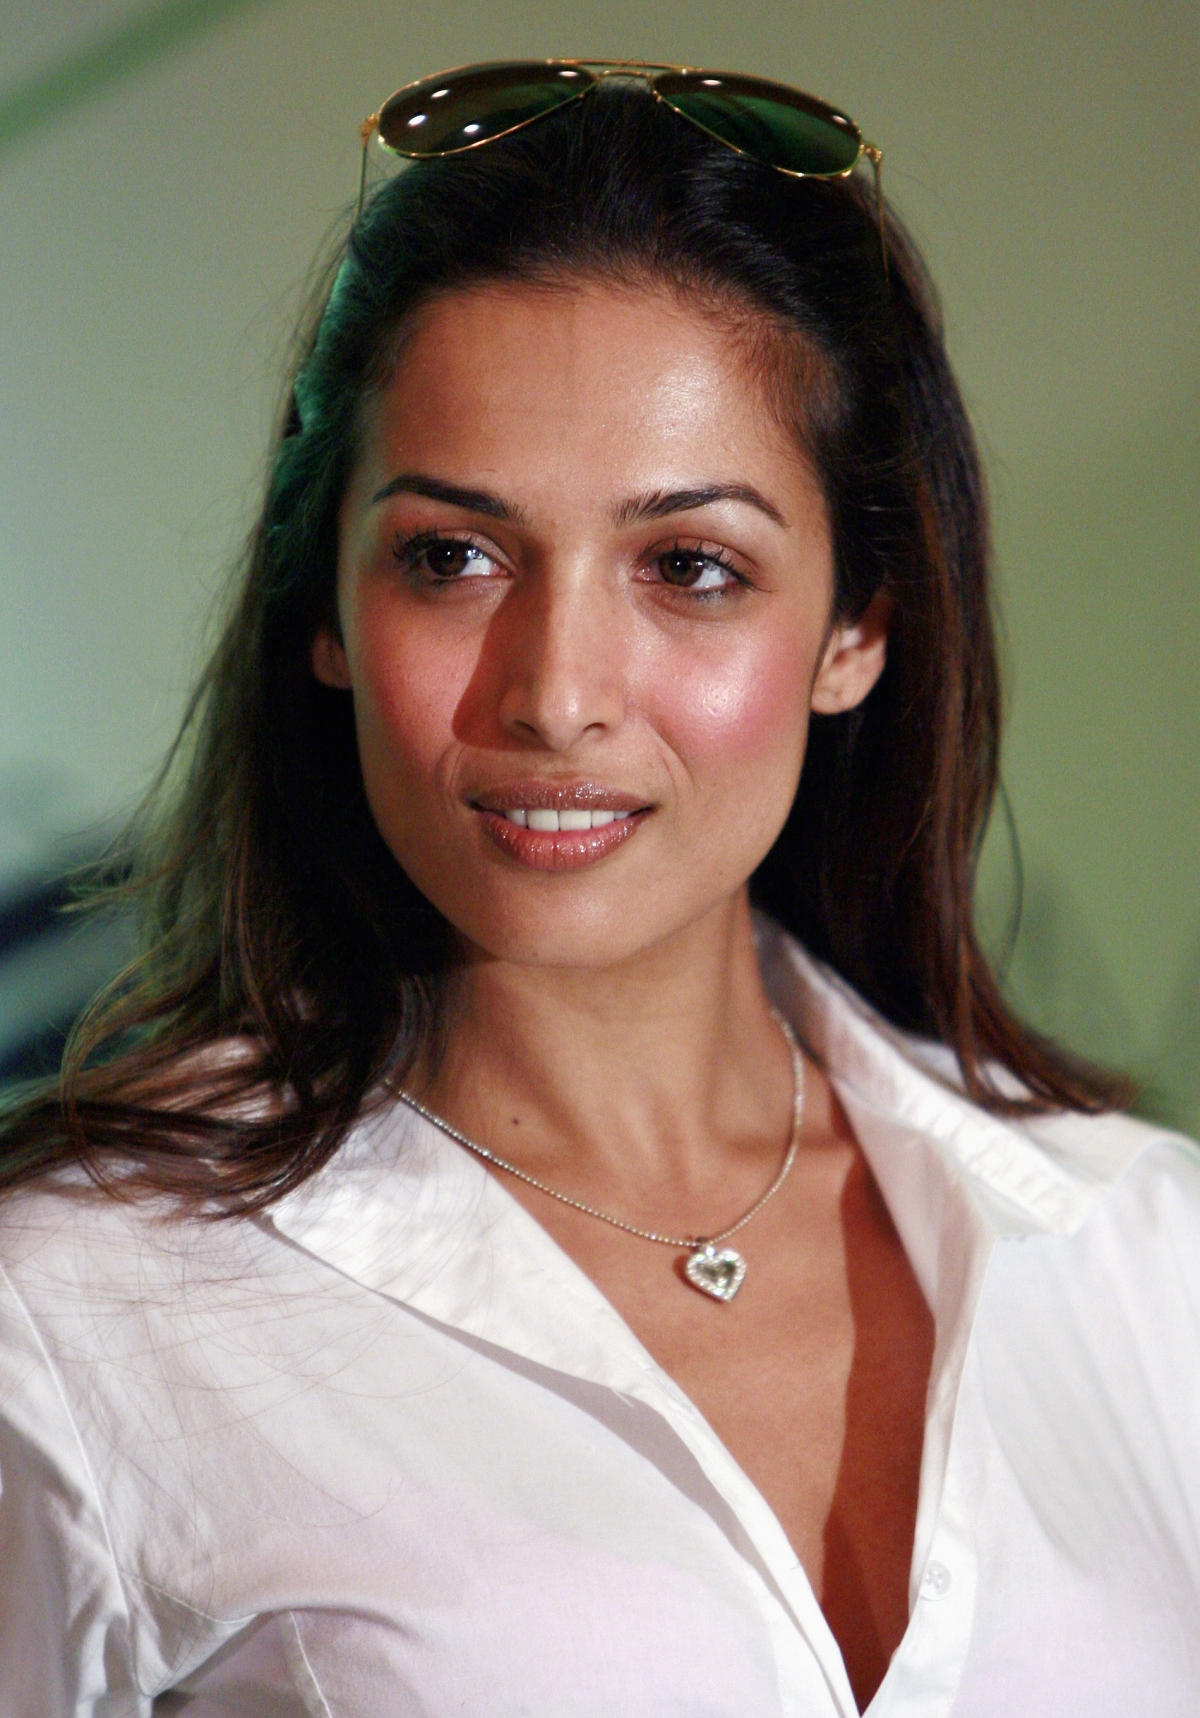 Malaika Arora Khan has denied reports that she had an extra-marital relationship with Arjun Kapoor.